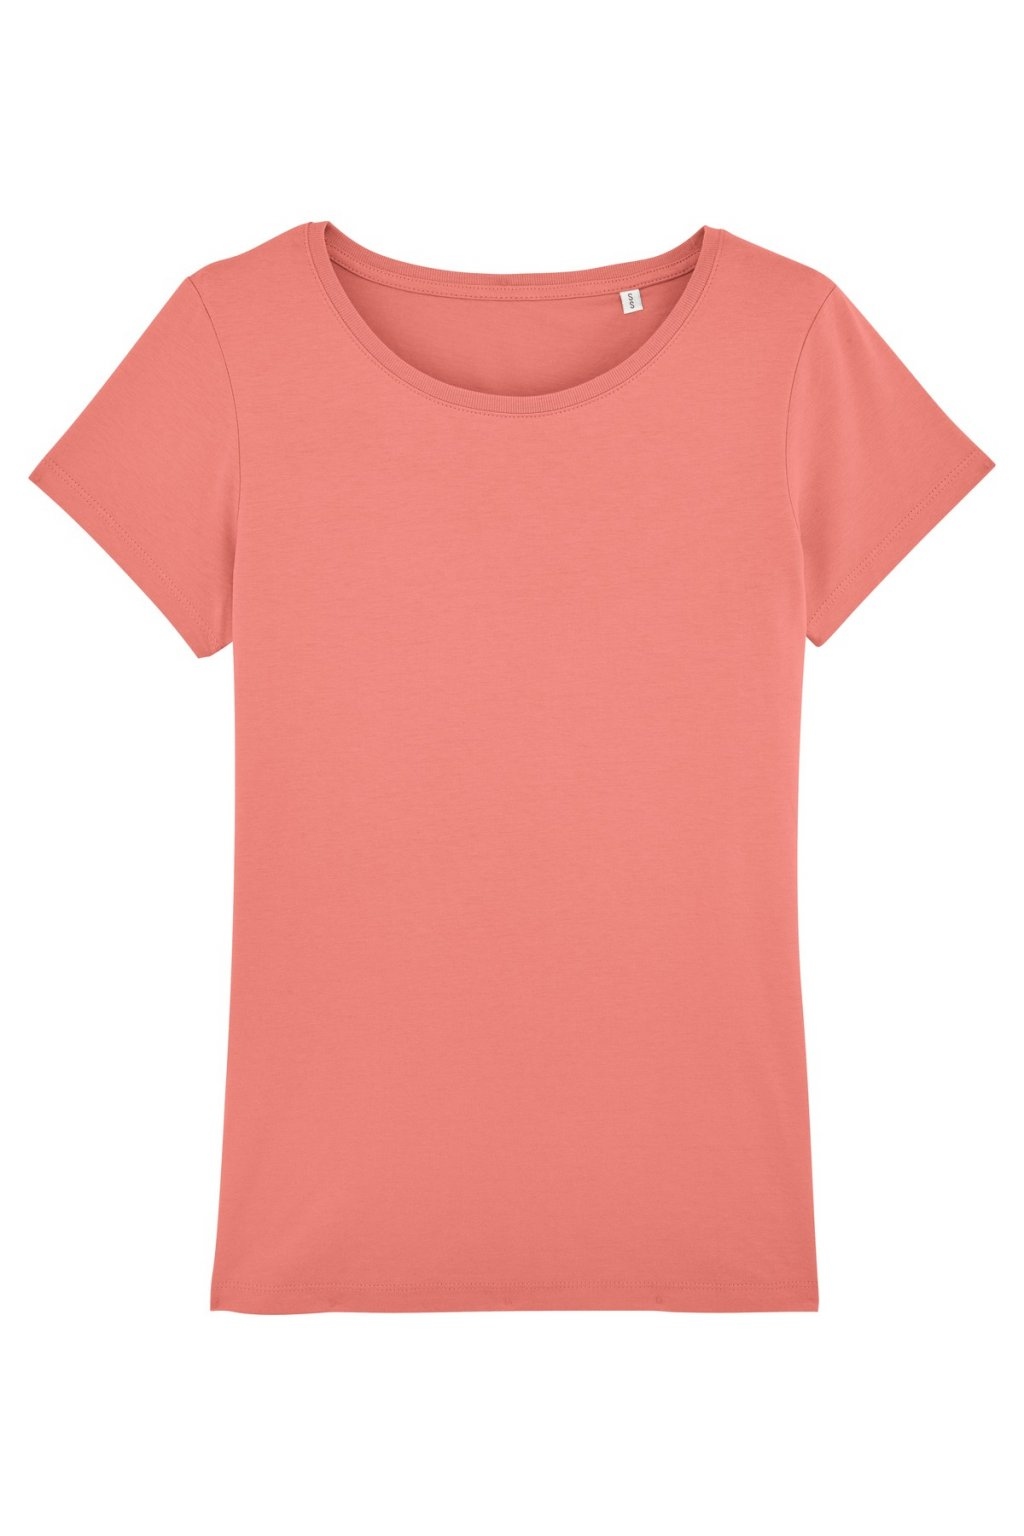 Stella Wants Flamingo Pink Packshot Front Main 0